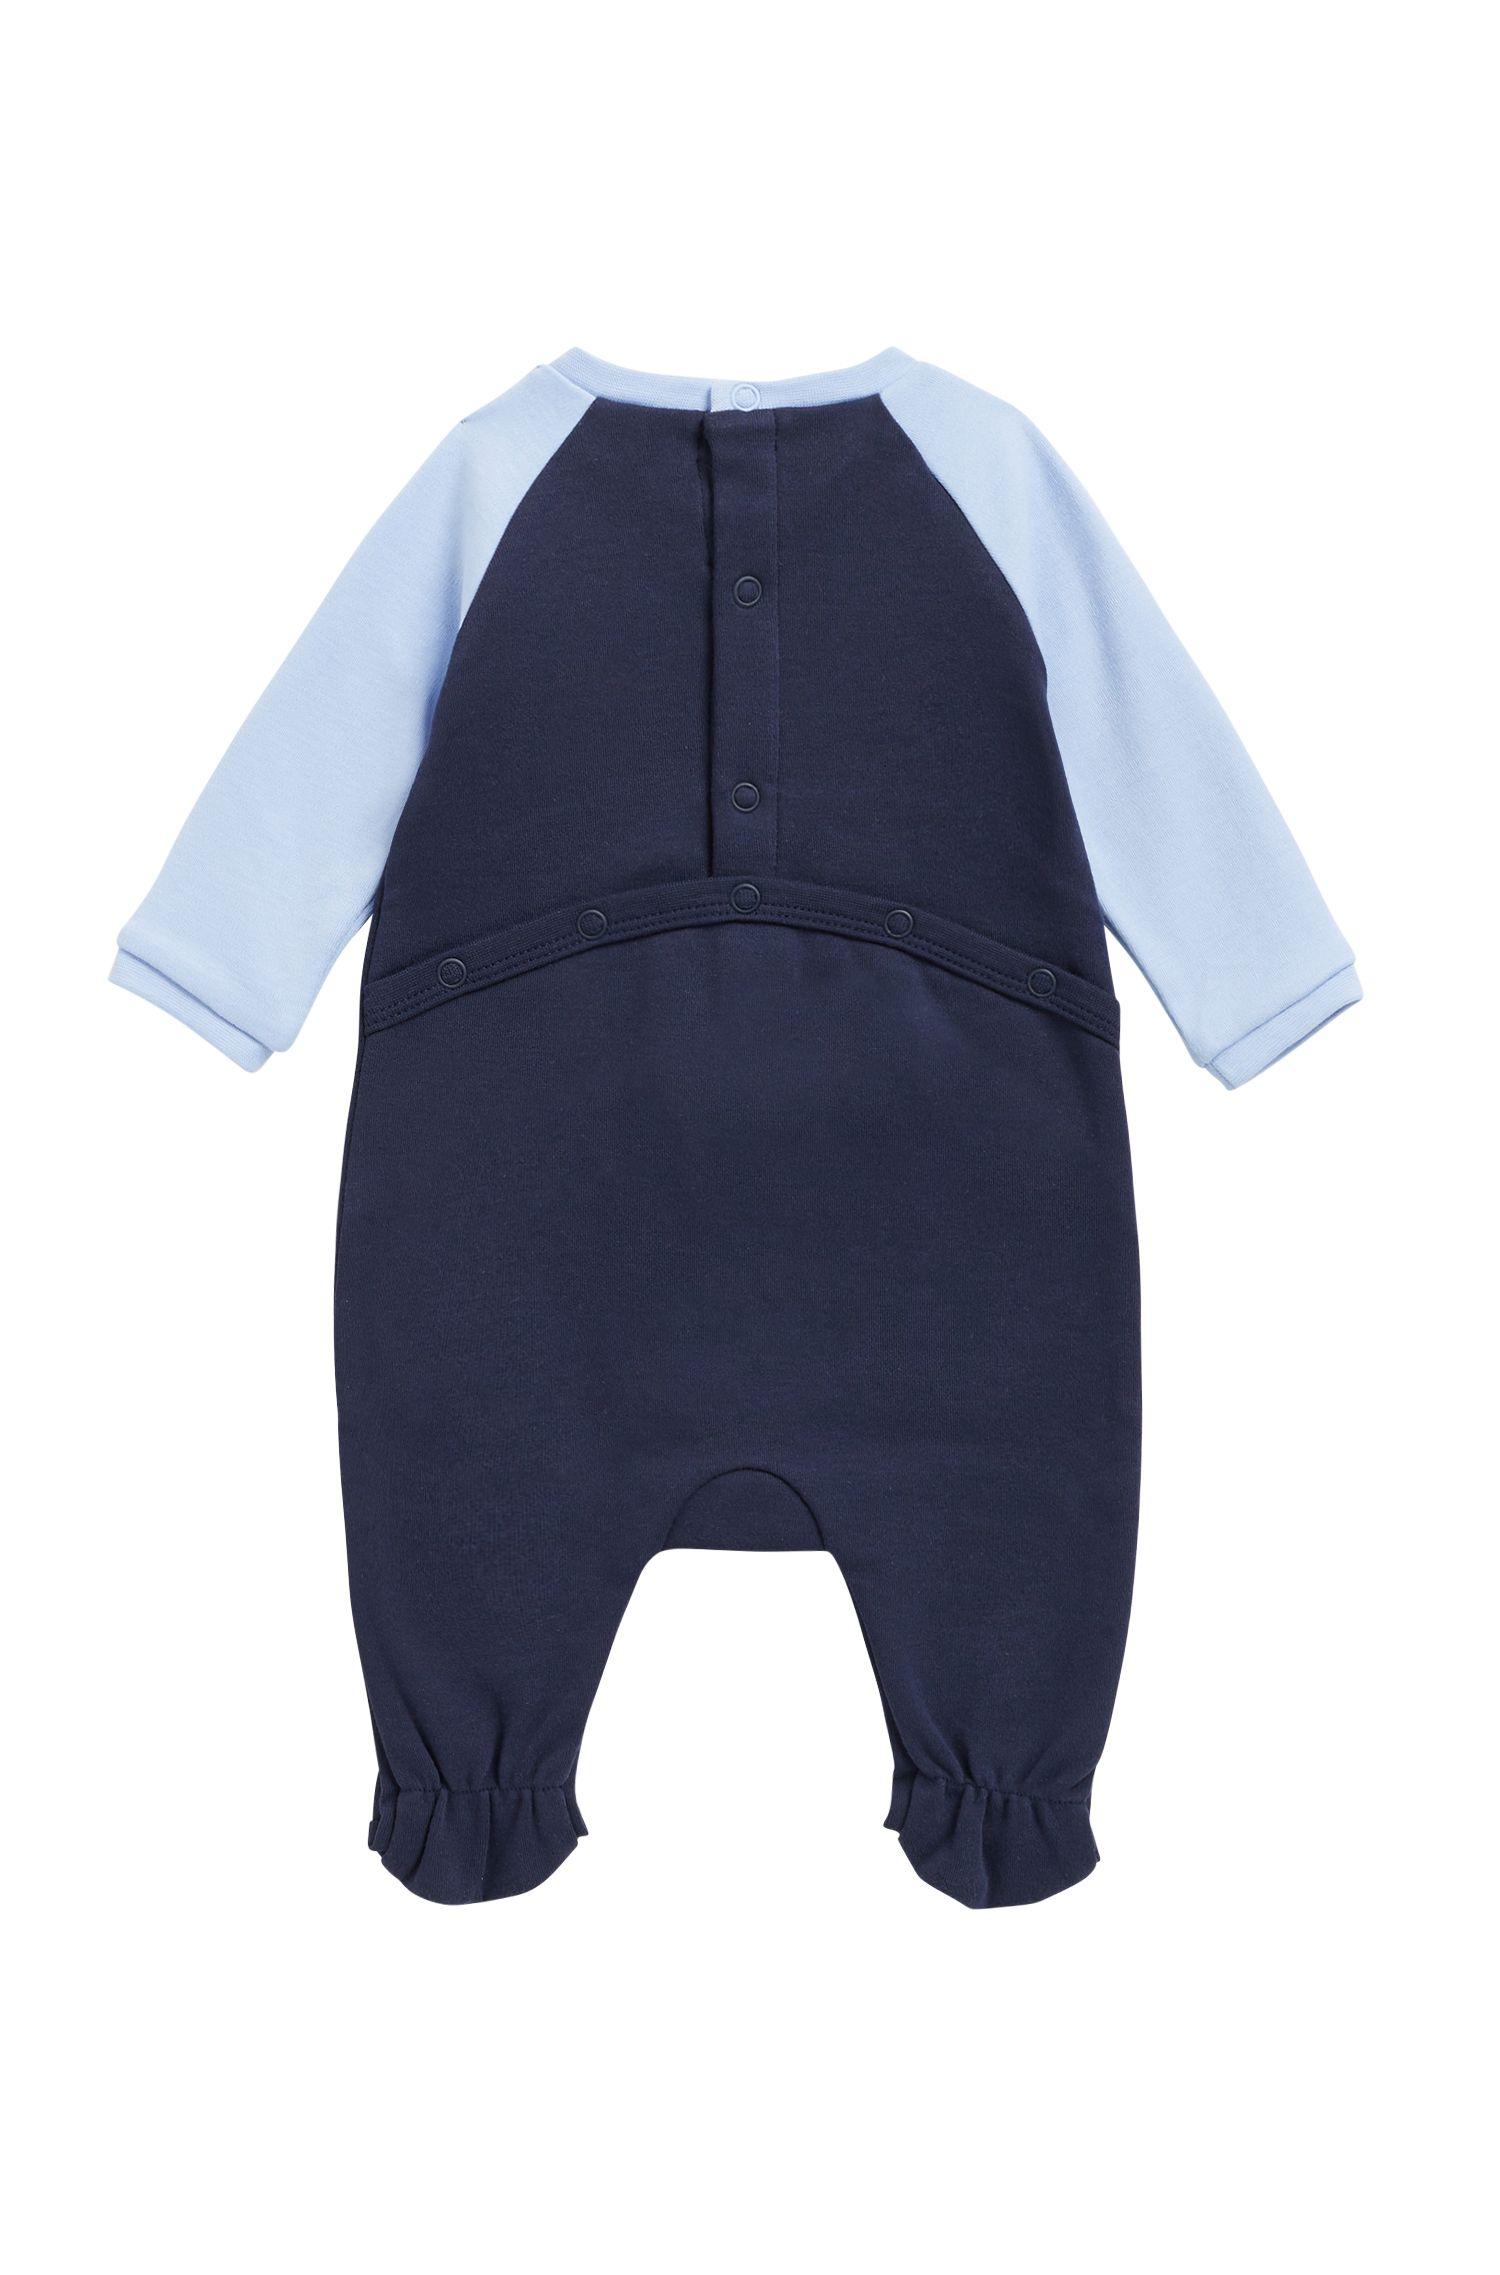 Baby sleepsuit and bib set in interlock cotton, Patterned